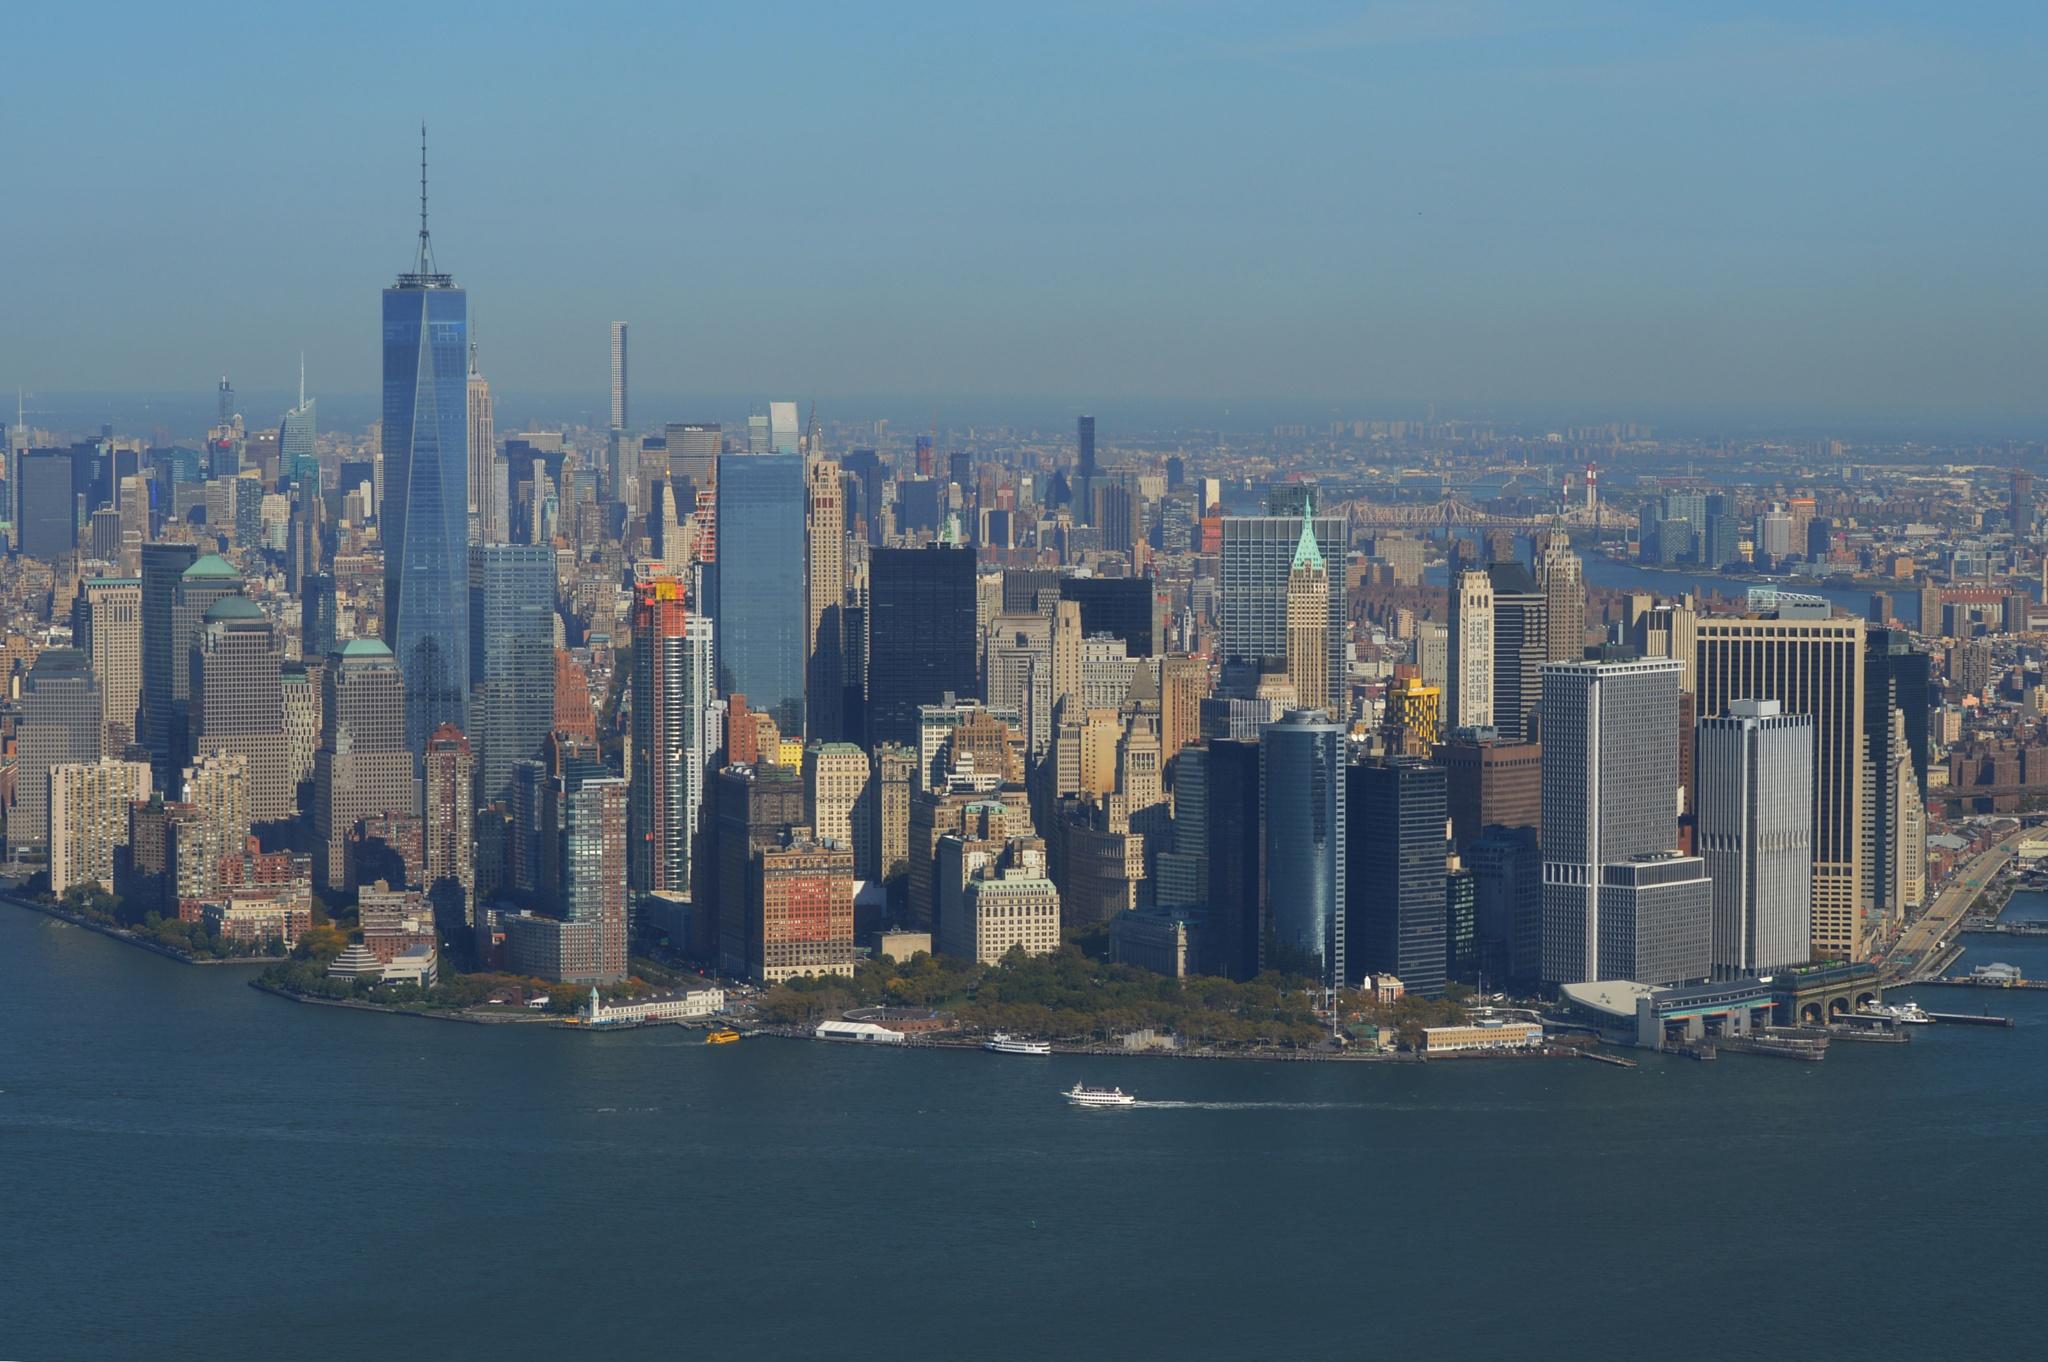 New York by Romatt02Art